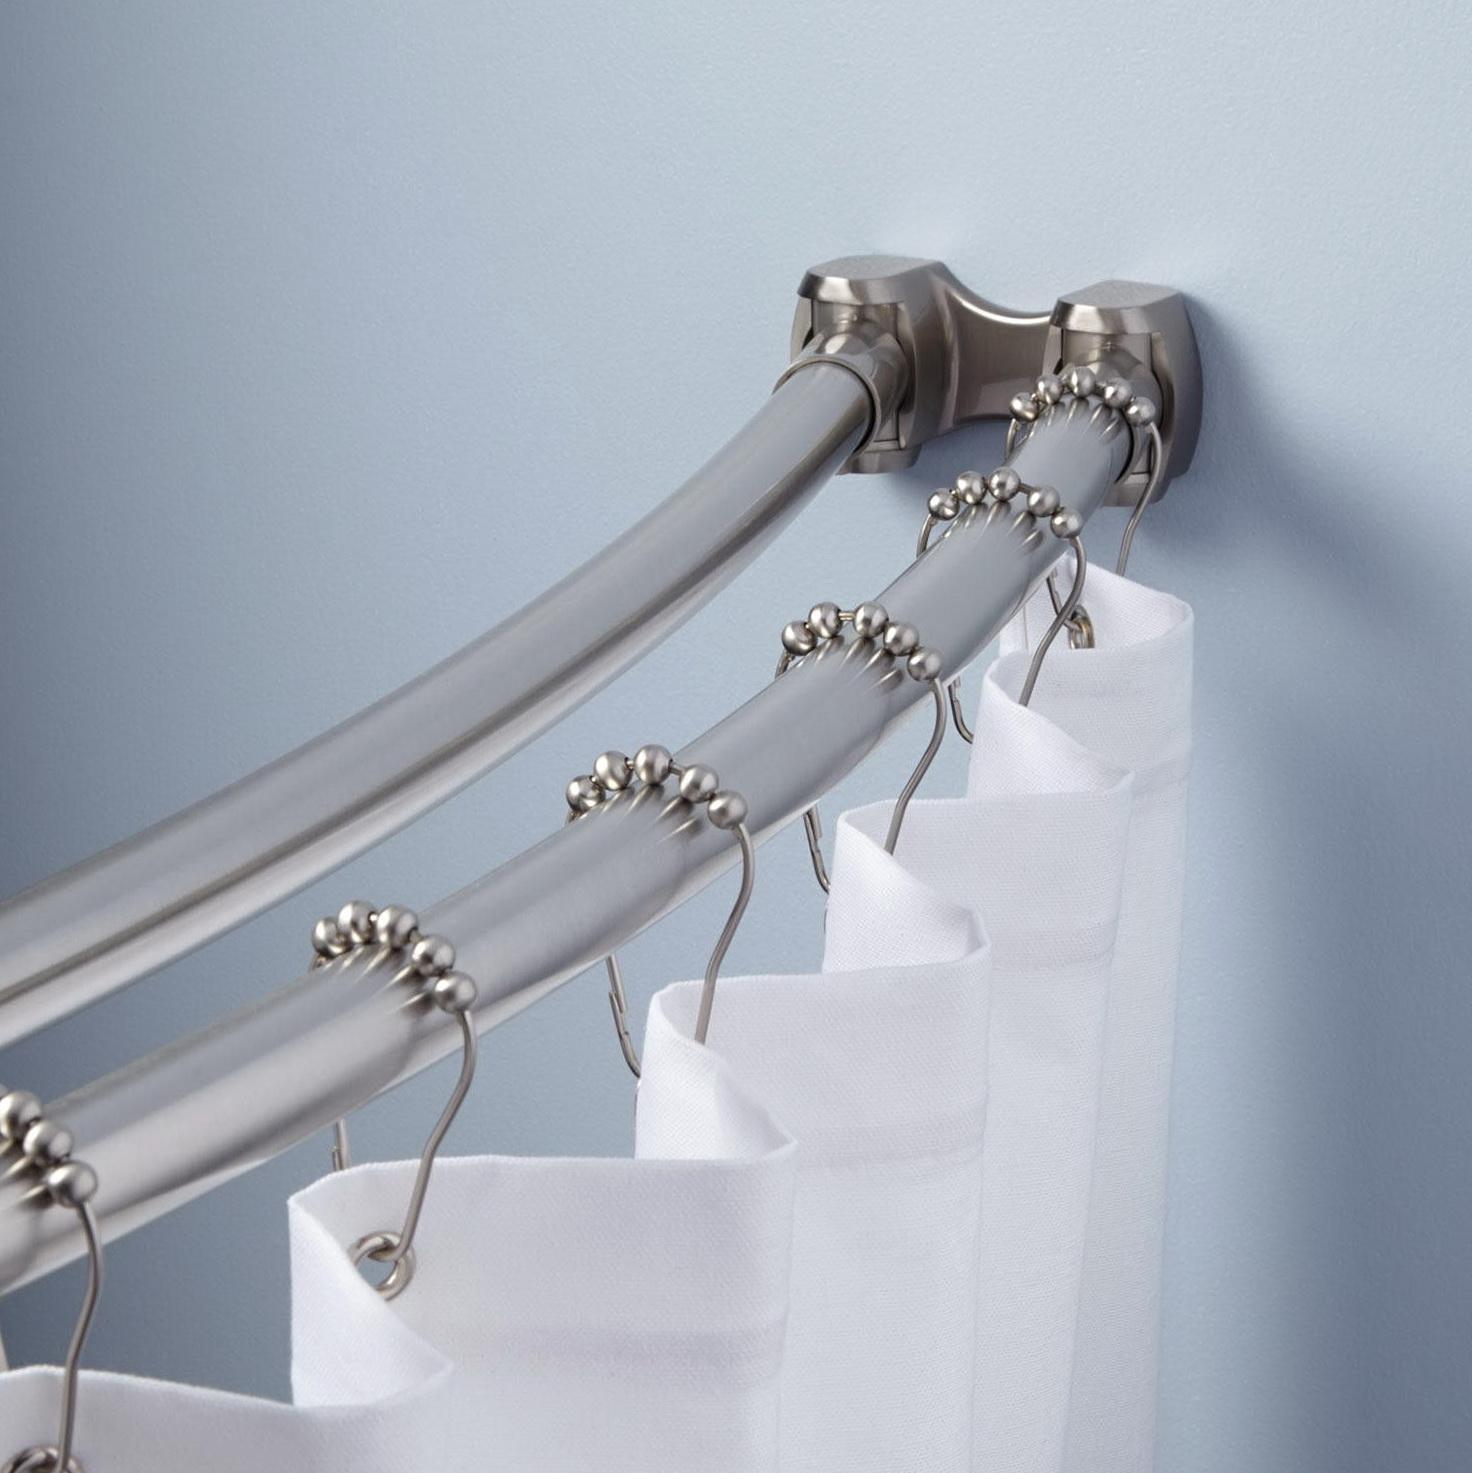 Bathroom Curtain Rods Curved Home Design Ideas